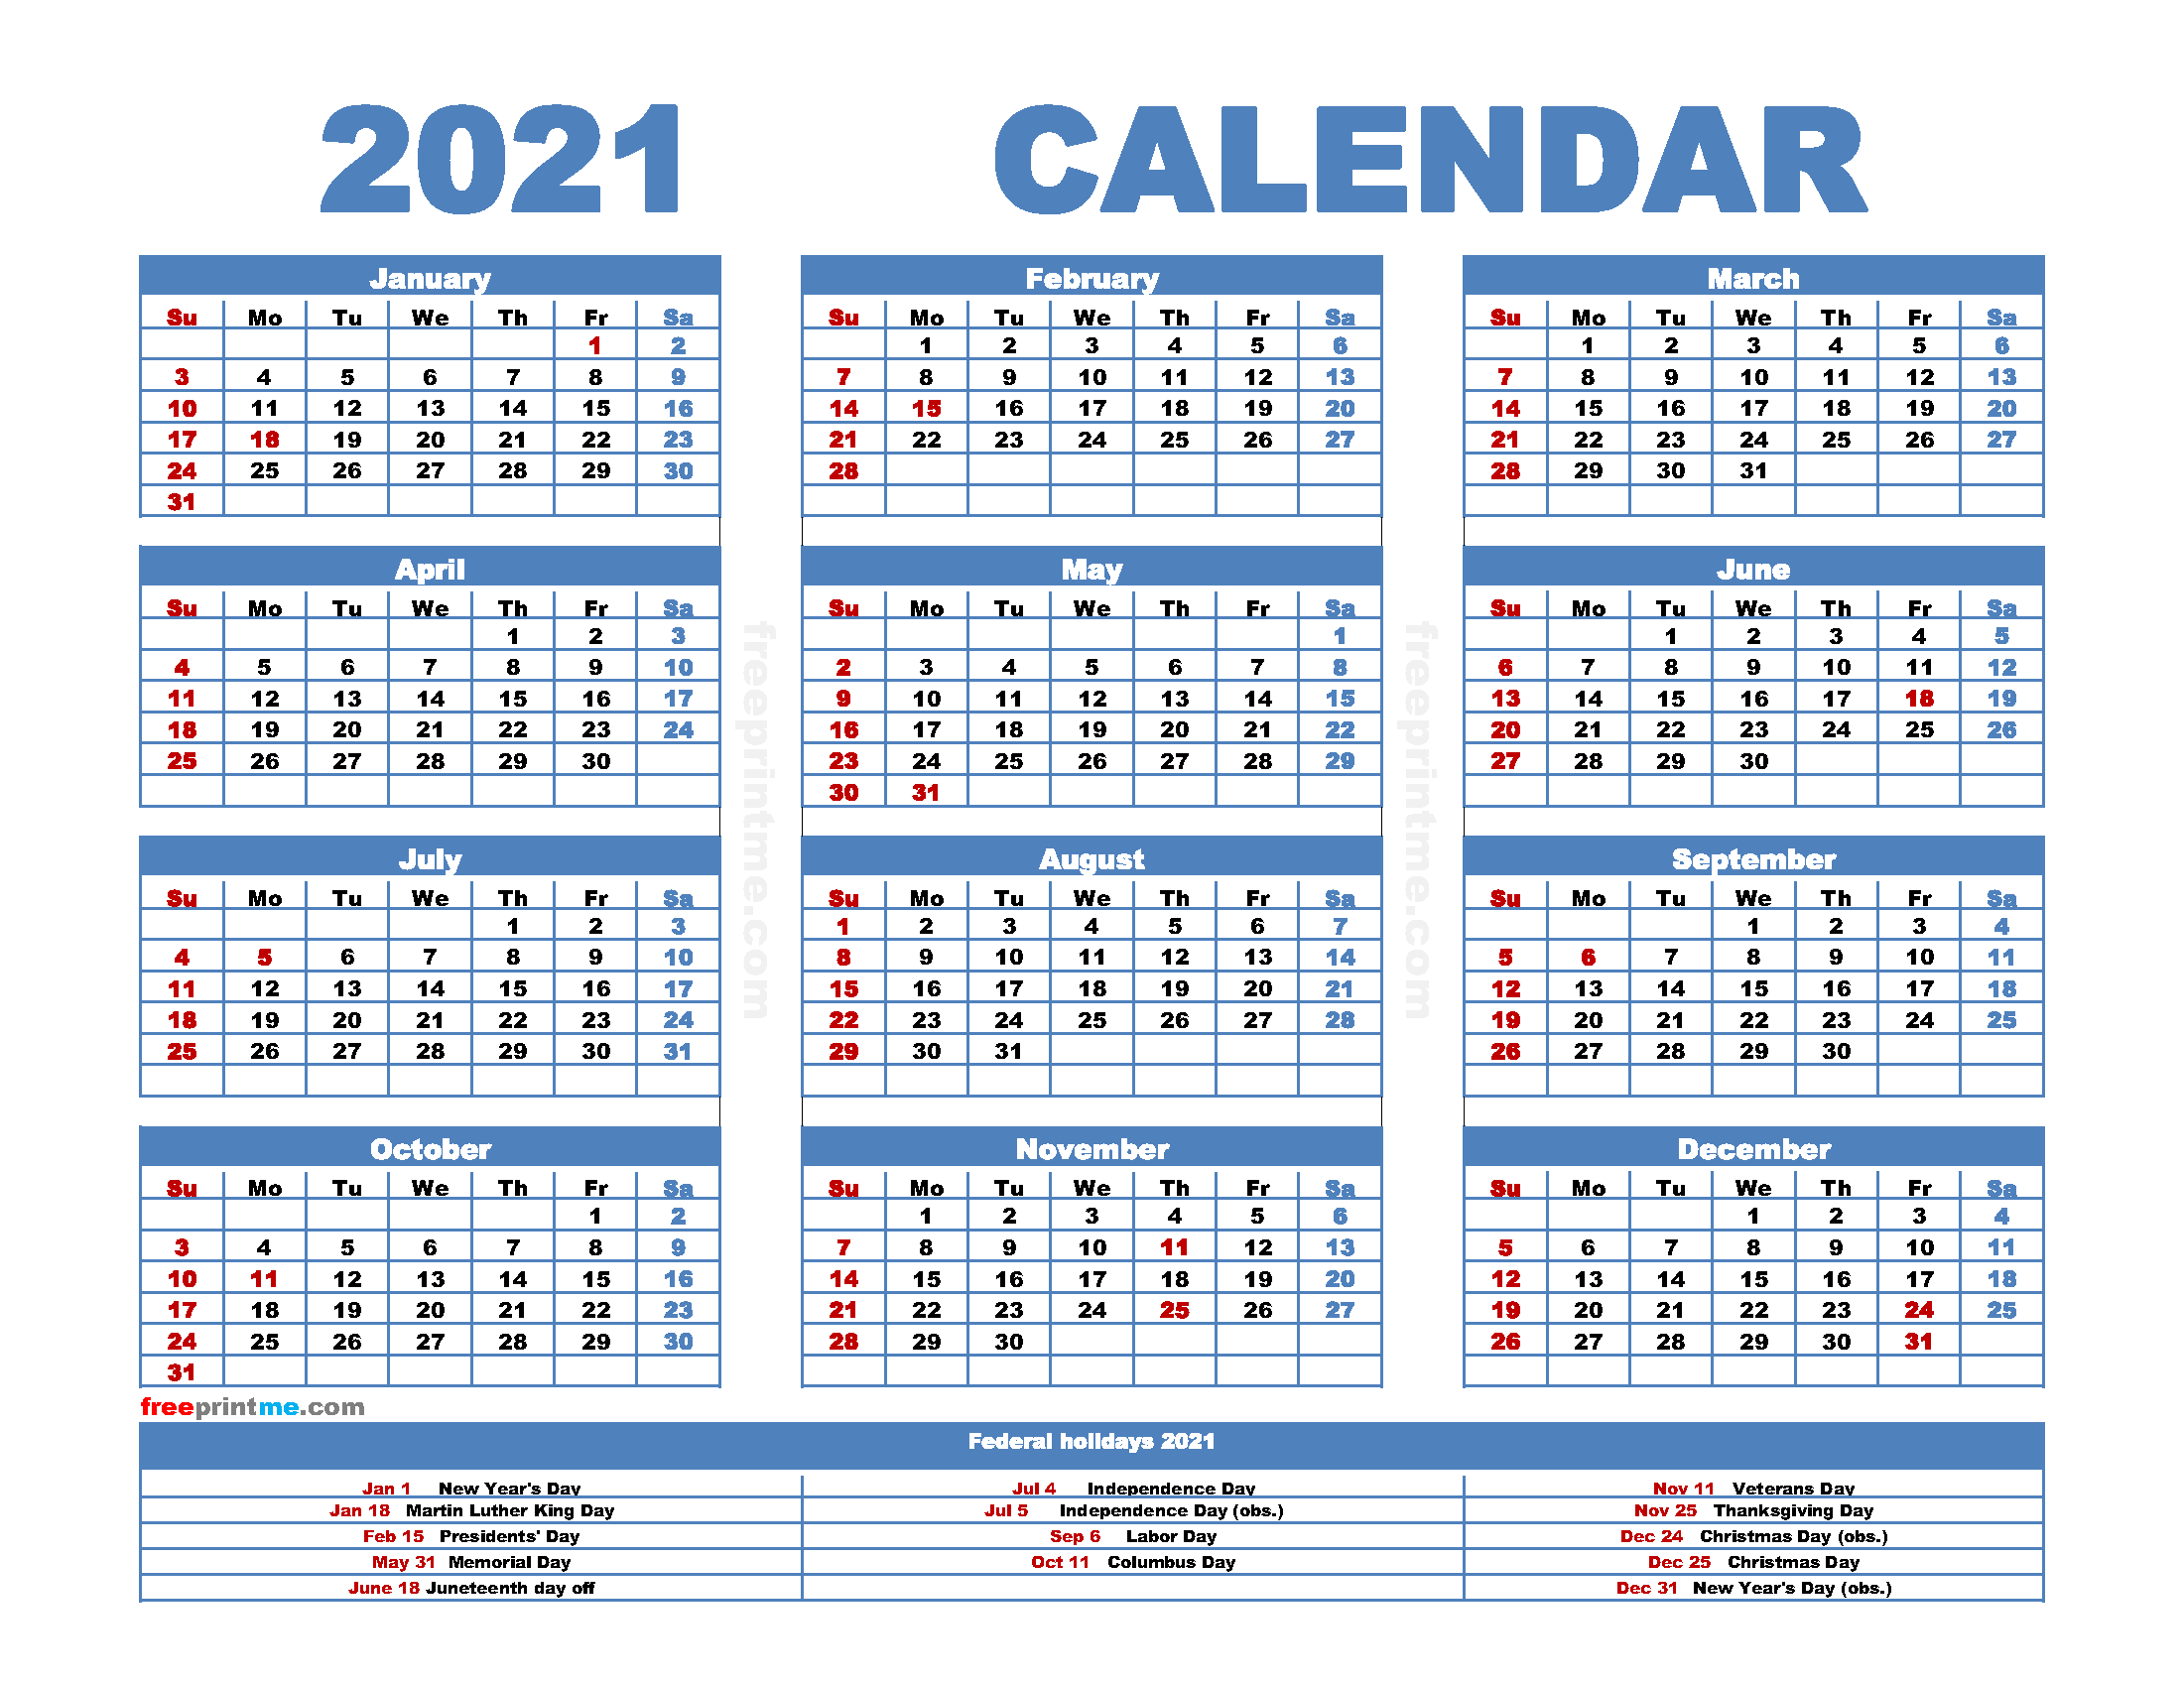 Free Printable 2021 Calendar with Holidays as PDF and Image